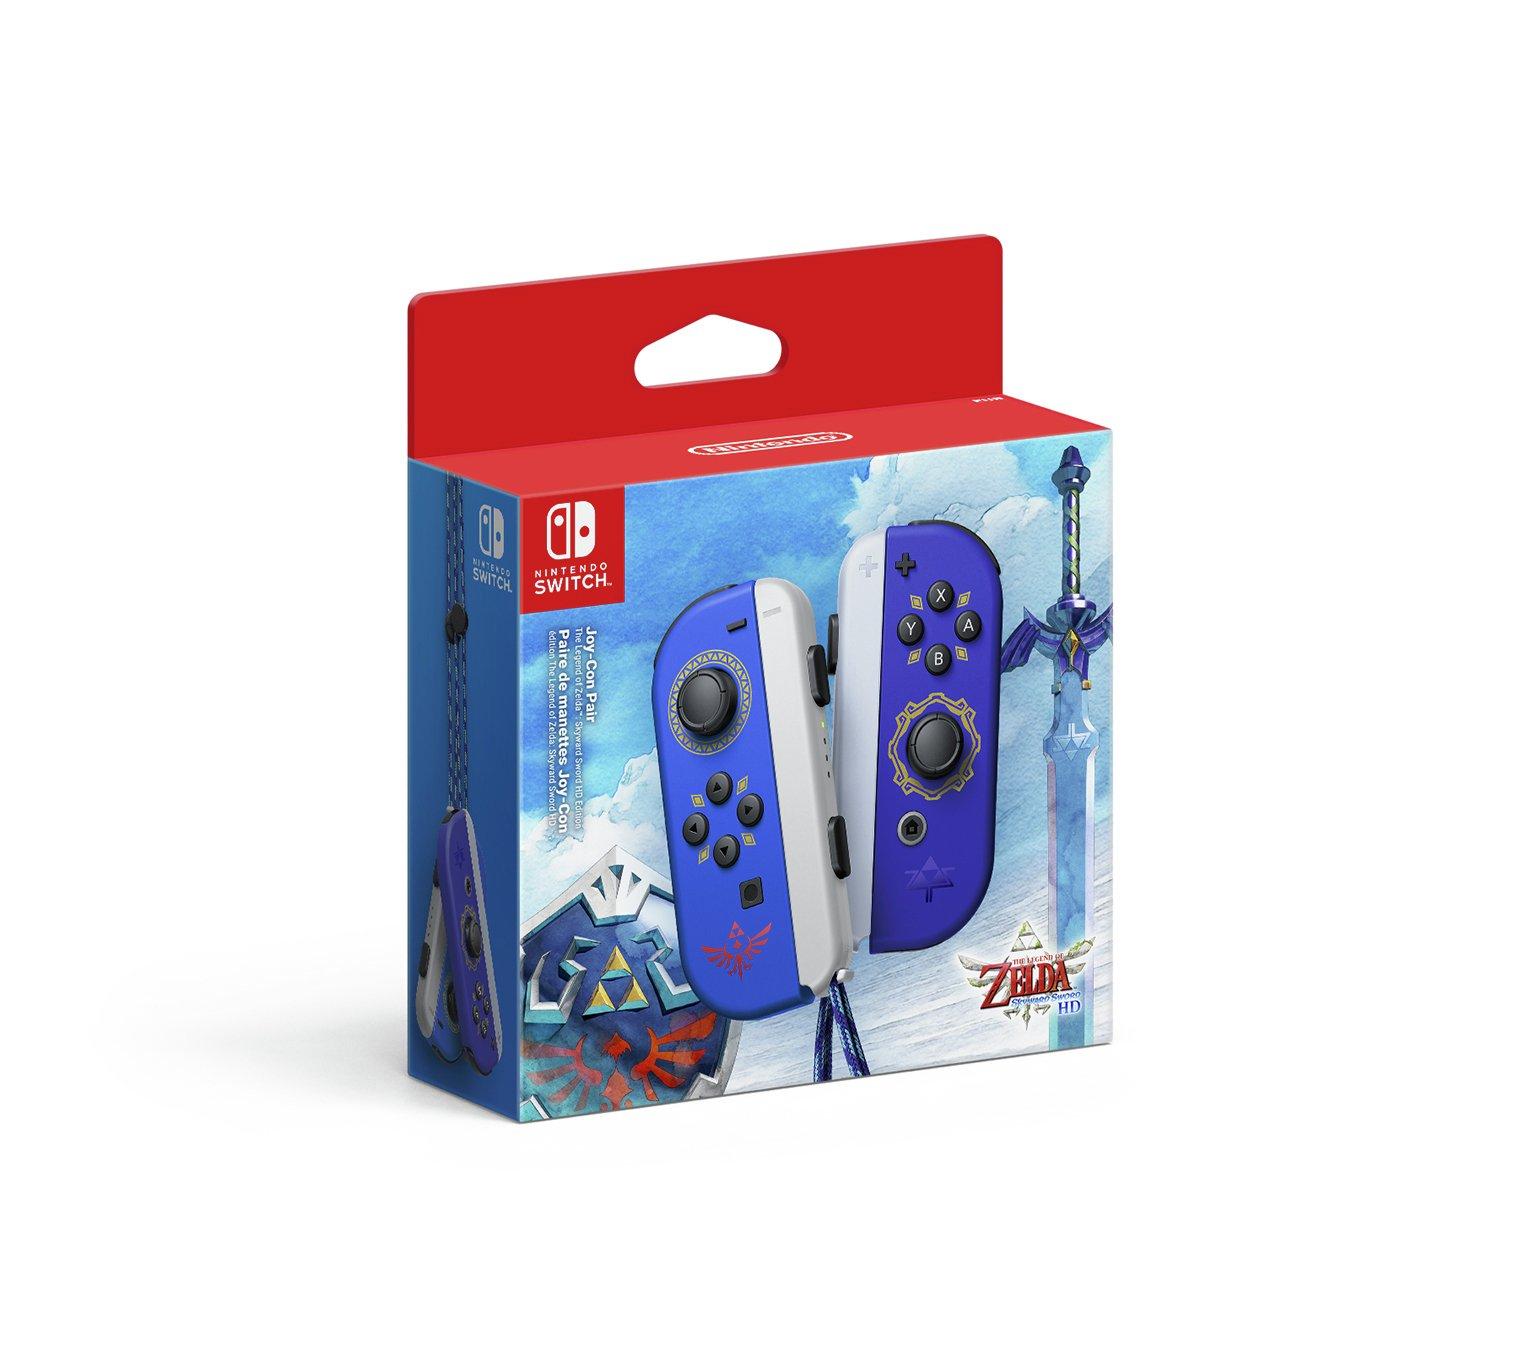 Nintendo Switch Joy-Con Pair - Skyward Sword Ed Pre-Order - £64.99 @ Argos